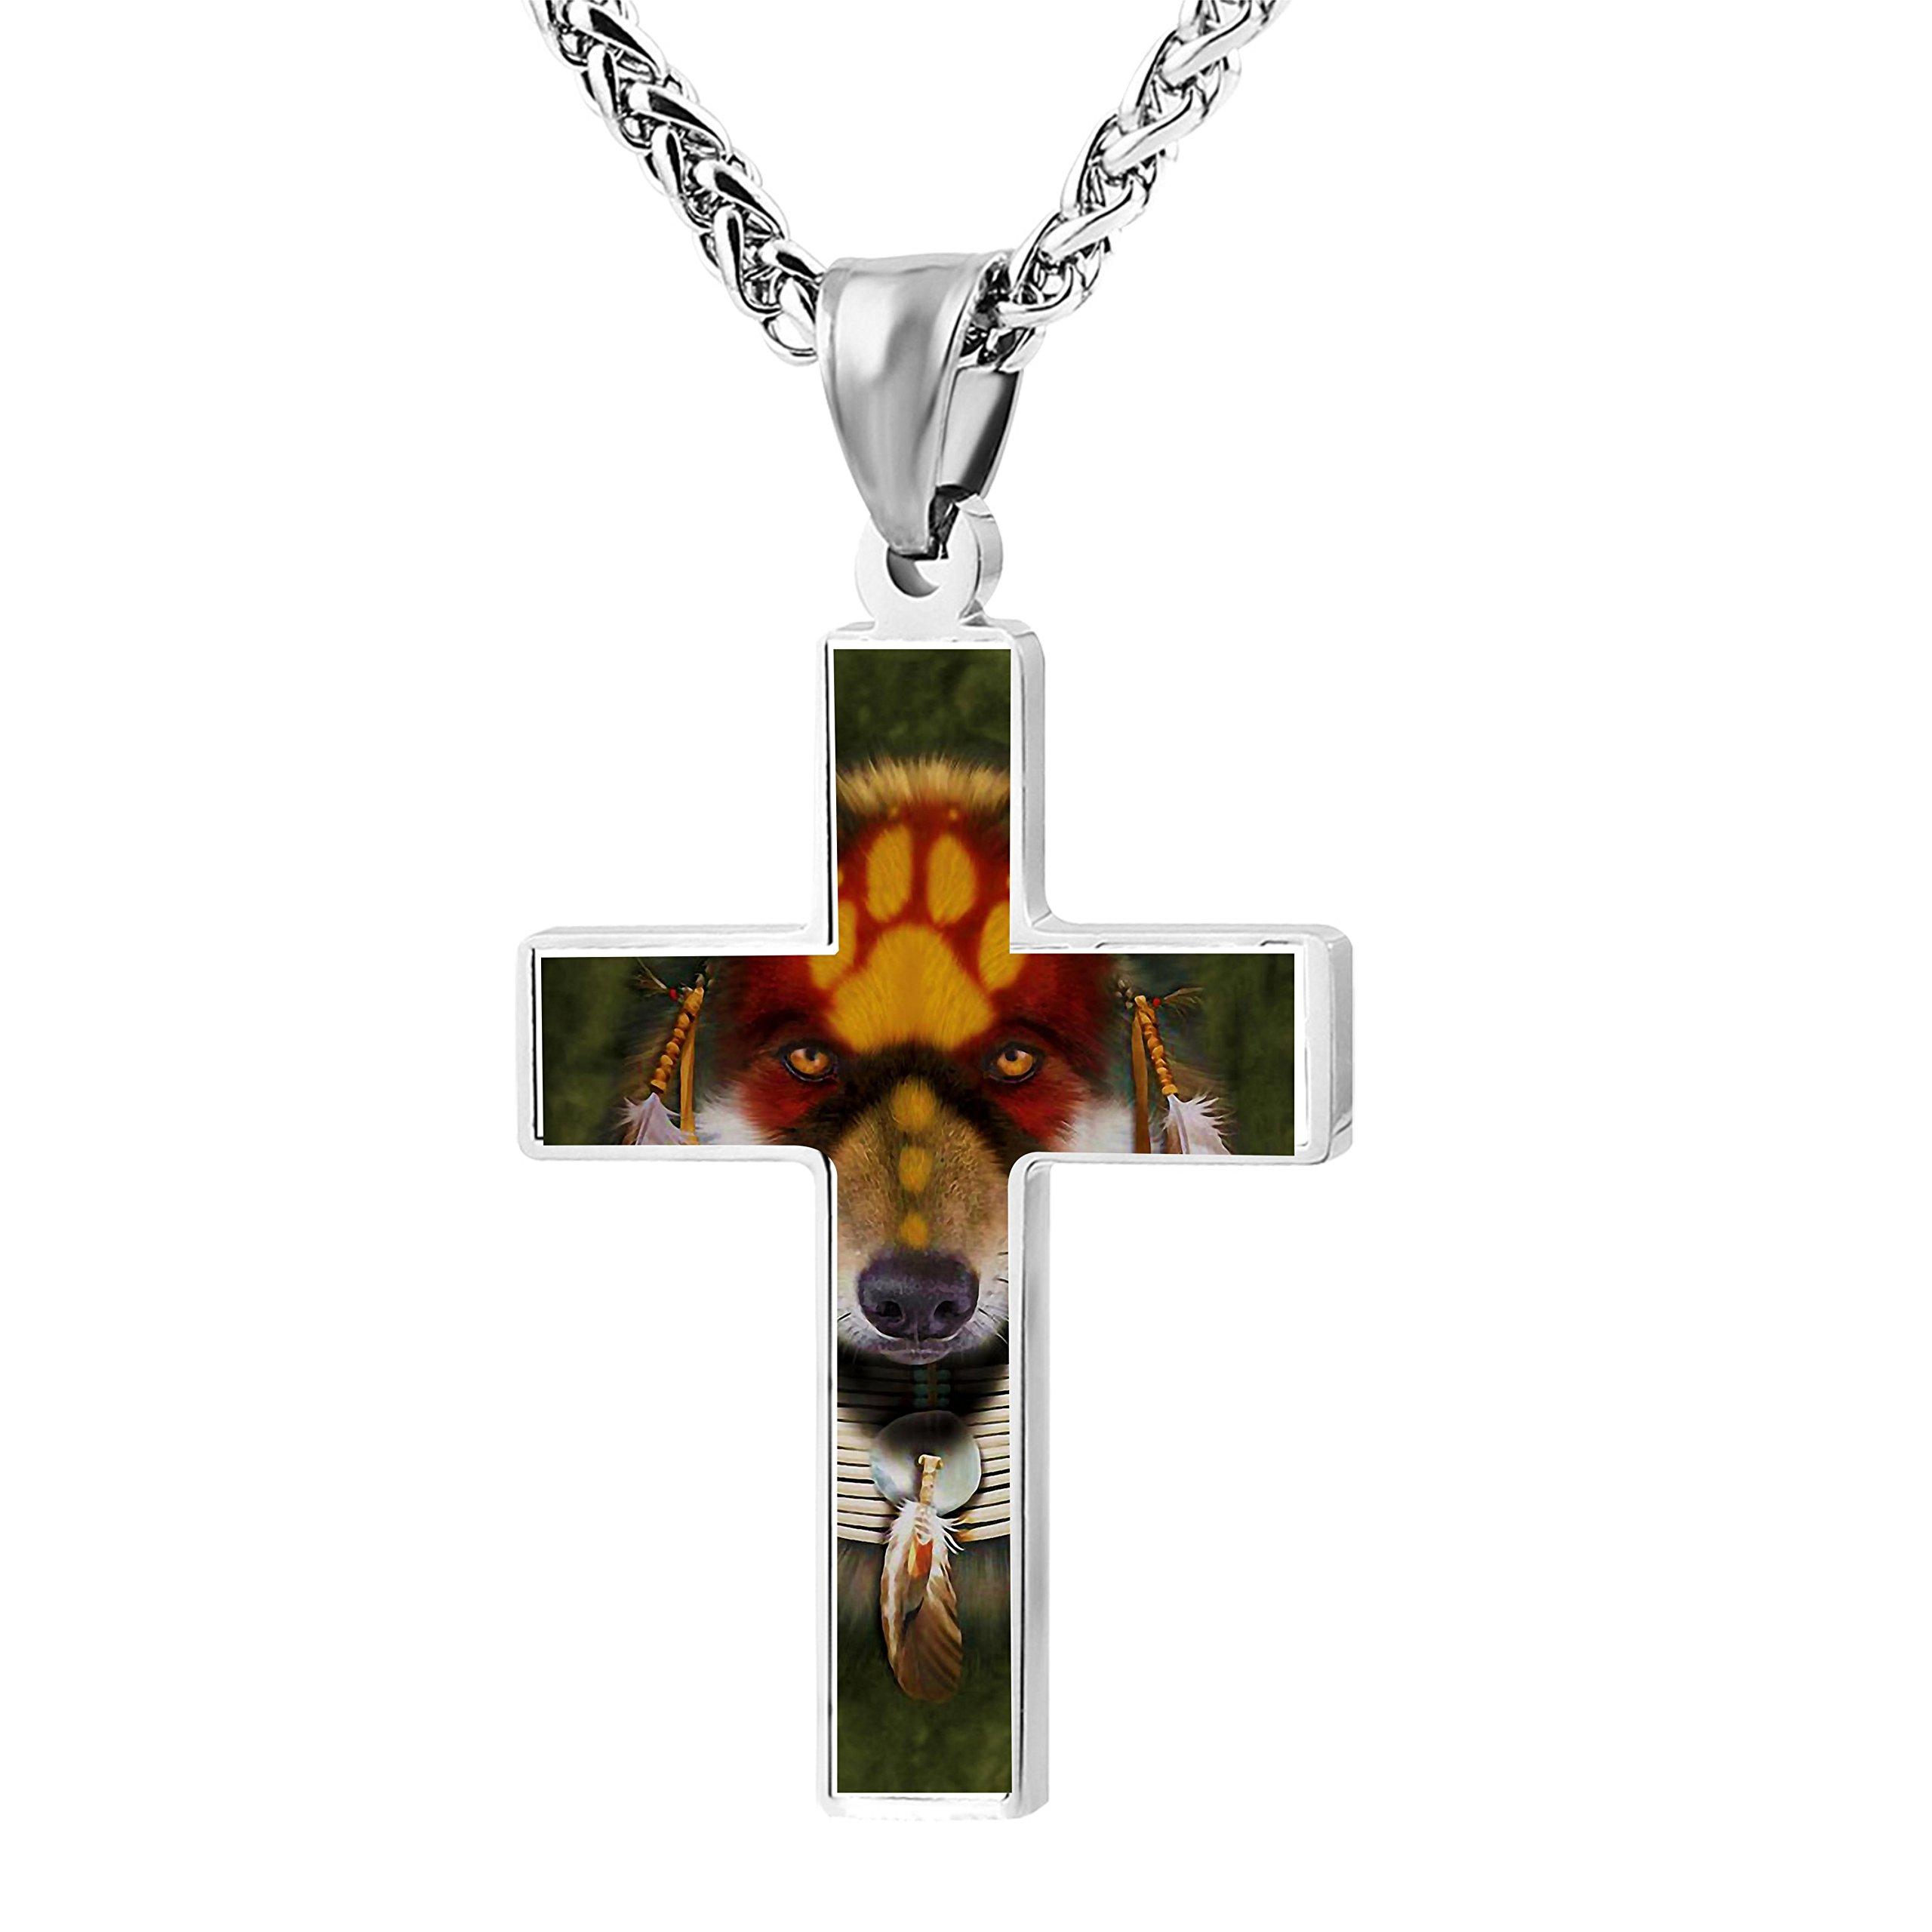 Patriotic Cross Native Wolf Religious Lord's Prayer Jewelry Pendant Necklace